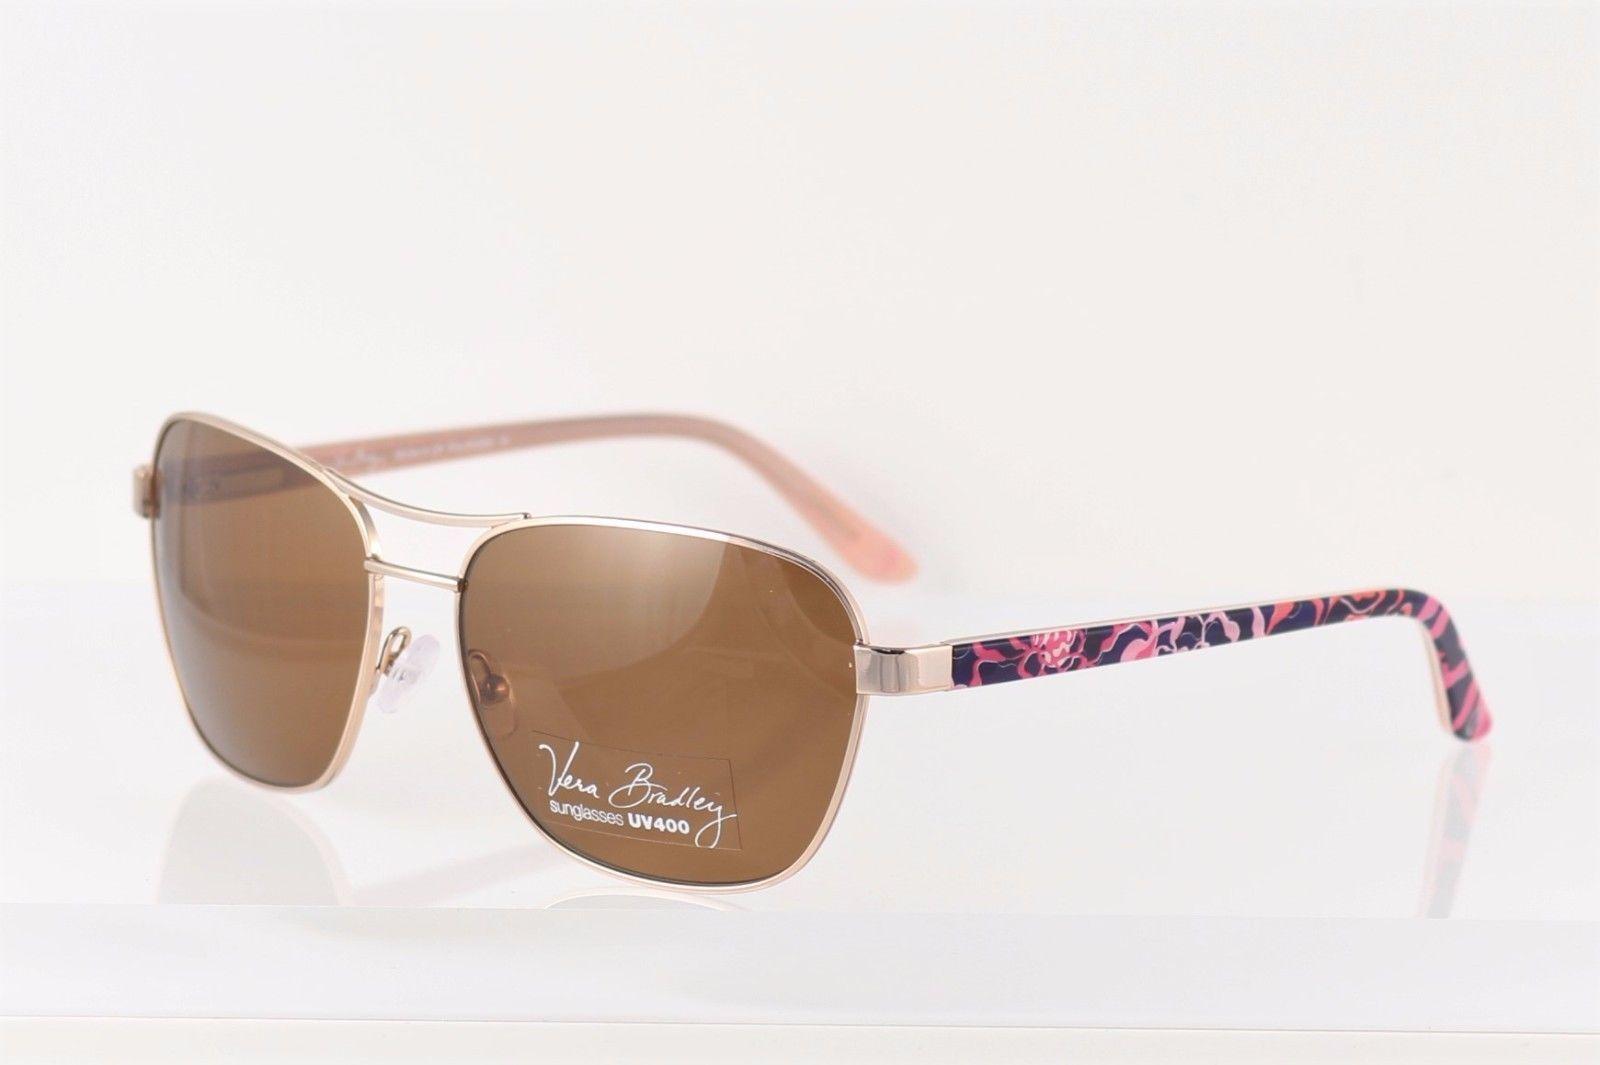 f0a63b0de34 Polarized Gold Vera Bradley Sunglasses Kim H Katalina Pink Case Retail  130+